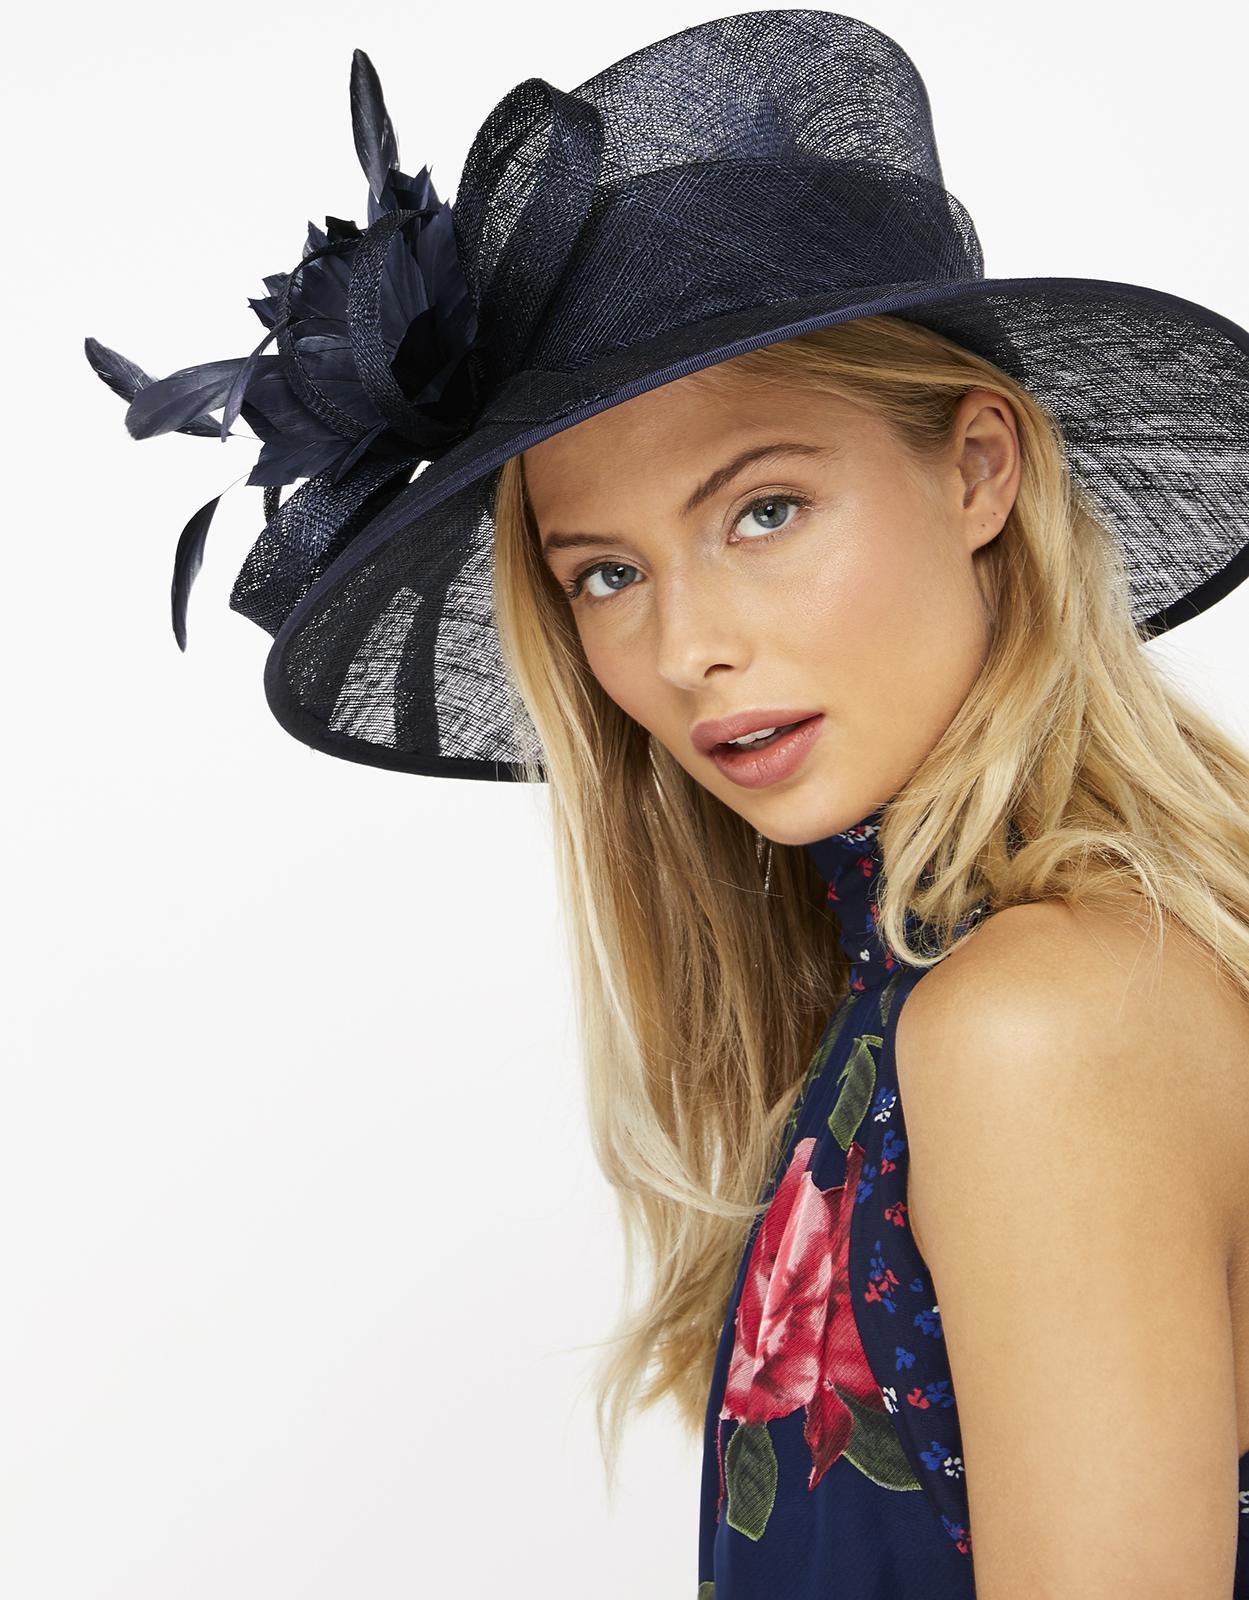 d8a7bcbb48a67e Monsoon Clarissa Corsage Hat in Blue - Lyst